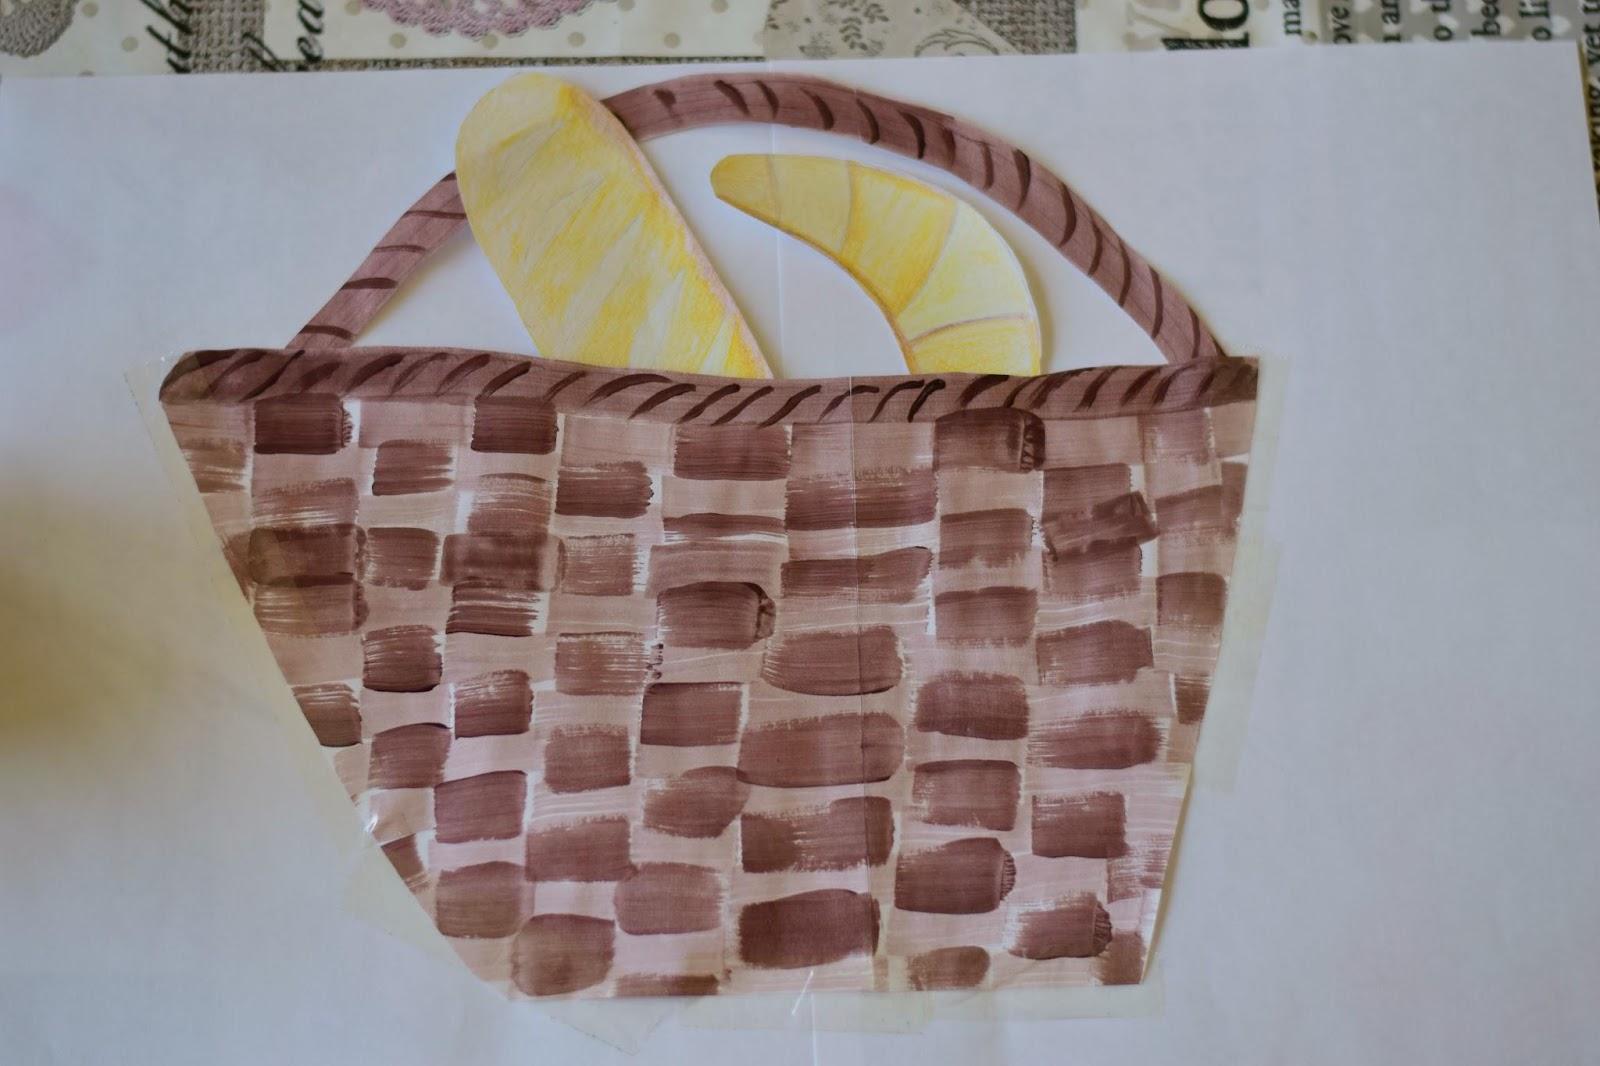 "(<img alt=""basket painting"">)"